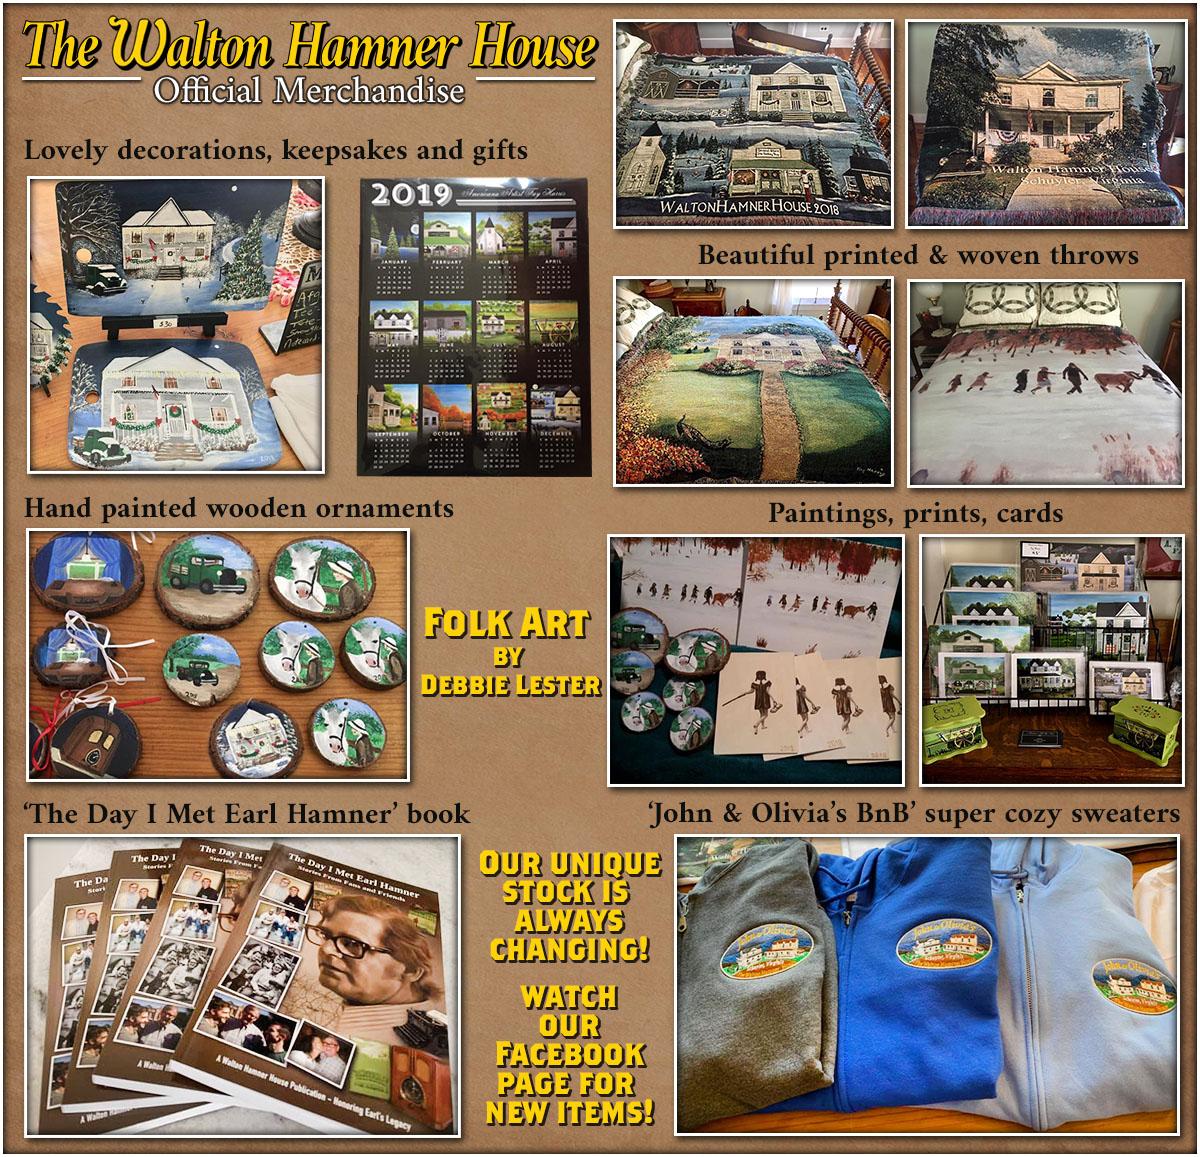 Walton Hamner House John & Olivia's BnB Gift shop